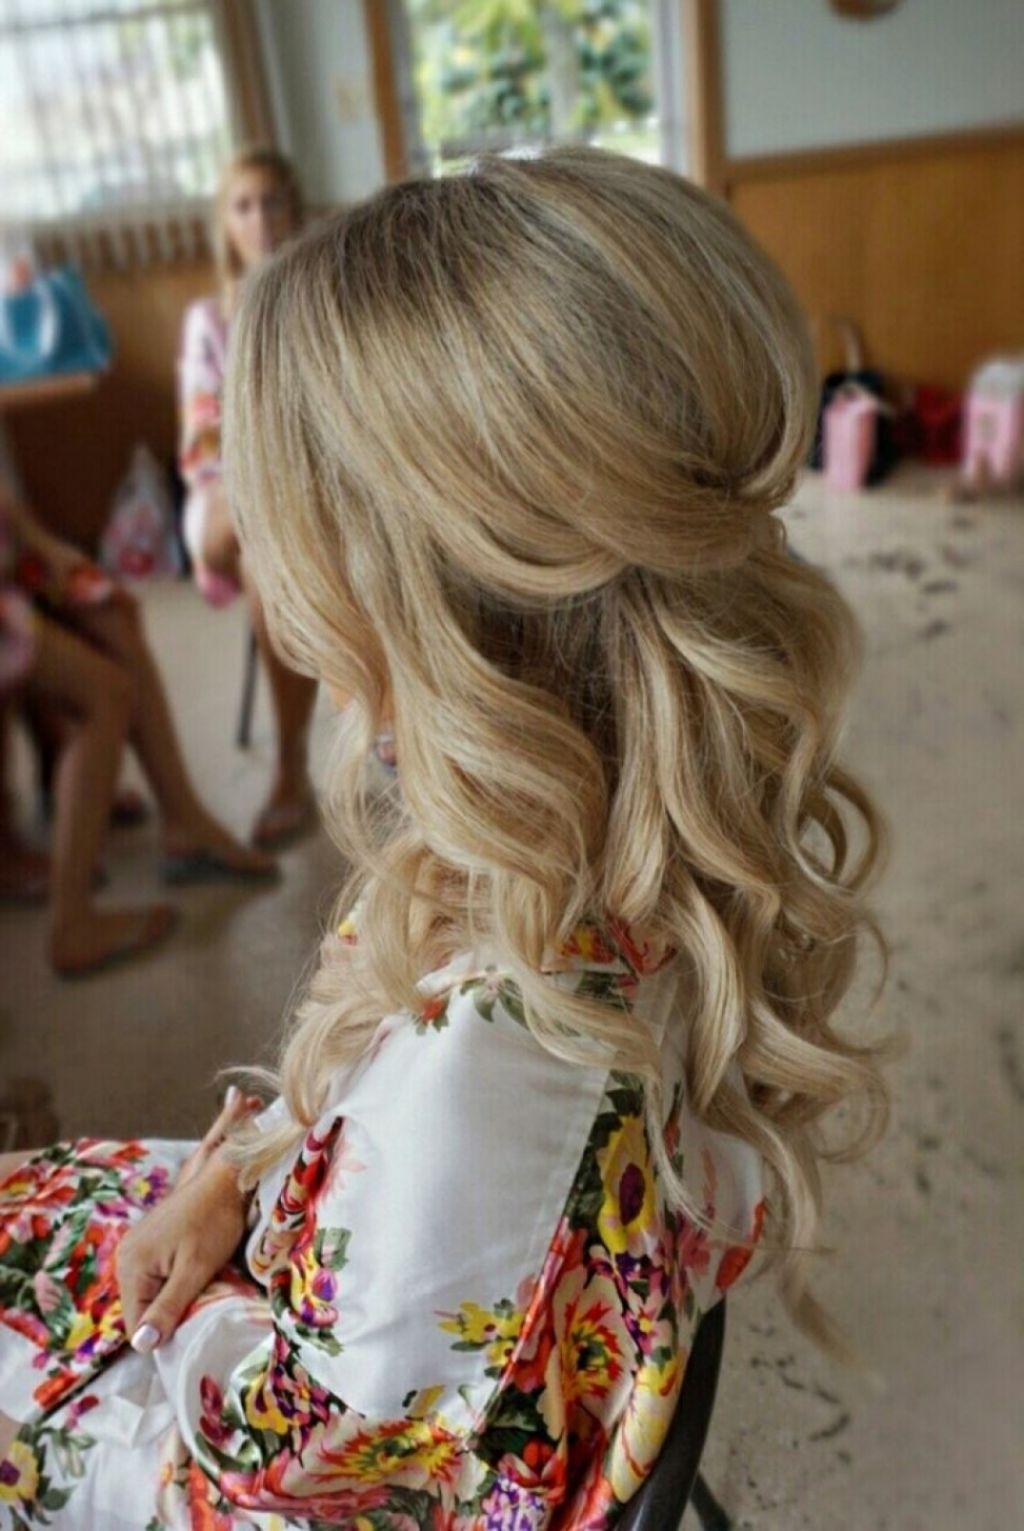 √ 24+ Wonderful Bridesmaid Hairstyles For Long Hair: Bridesmaid Inside Most Recent Wedding Hairstyles For Long Hair For Bridesmaids (Gallery 14 of 15)